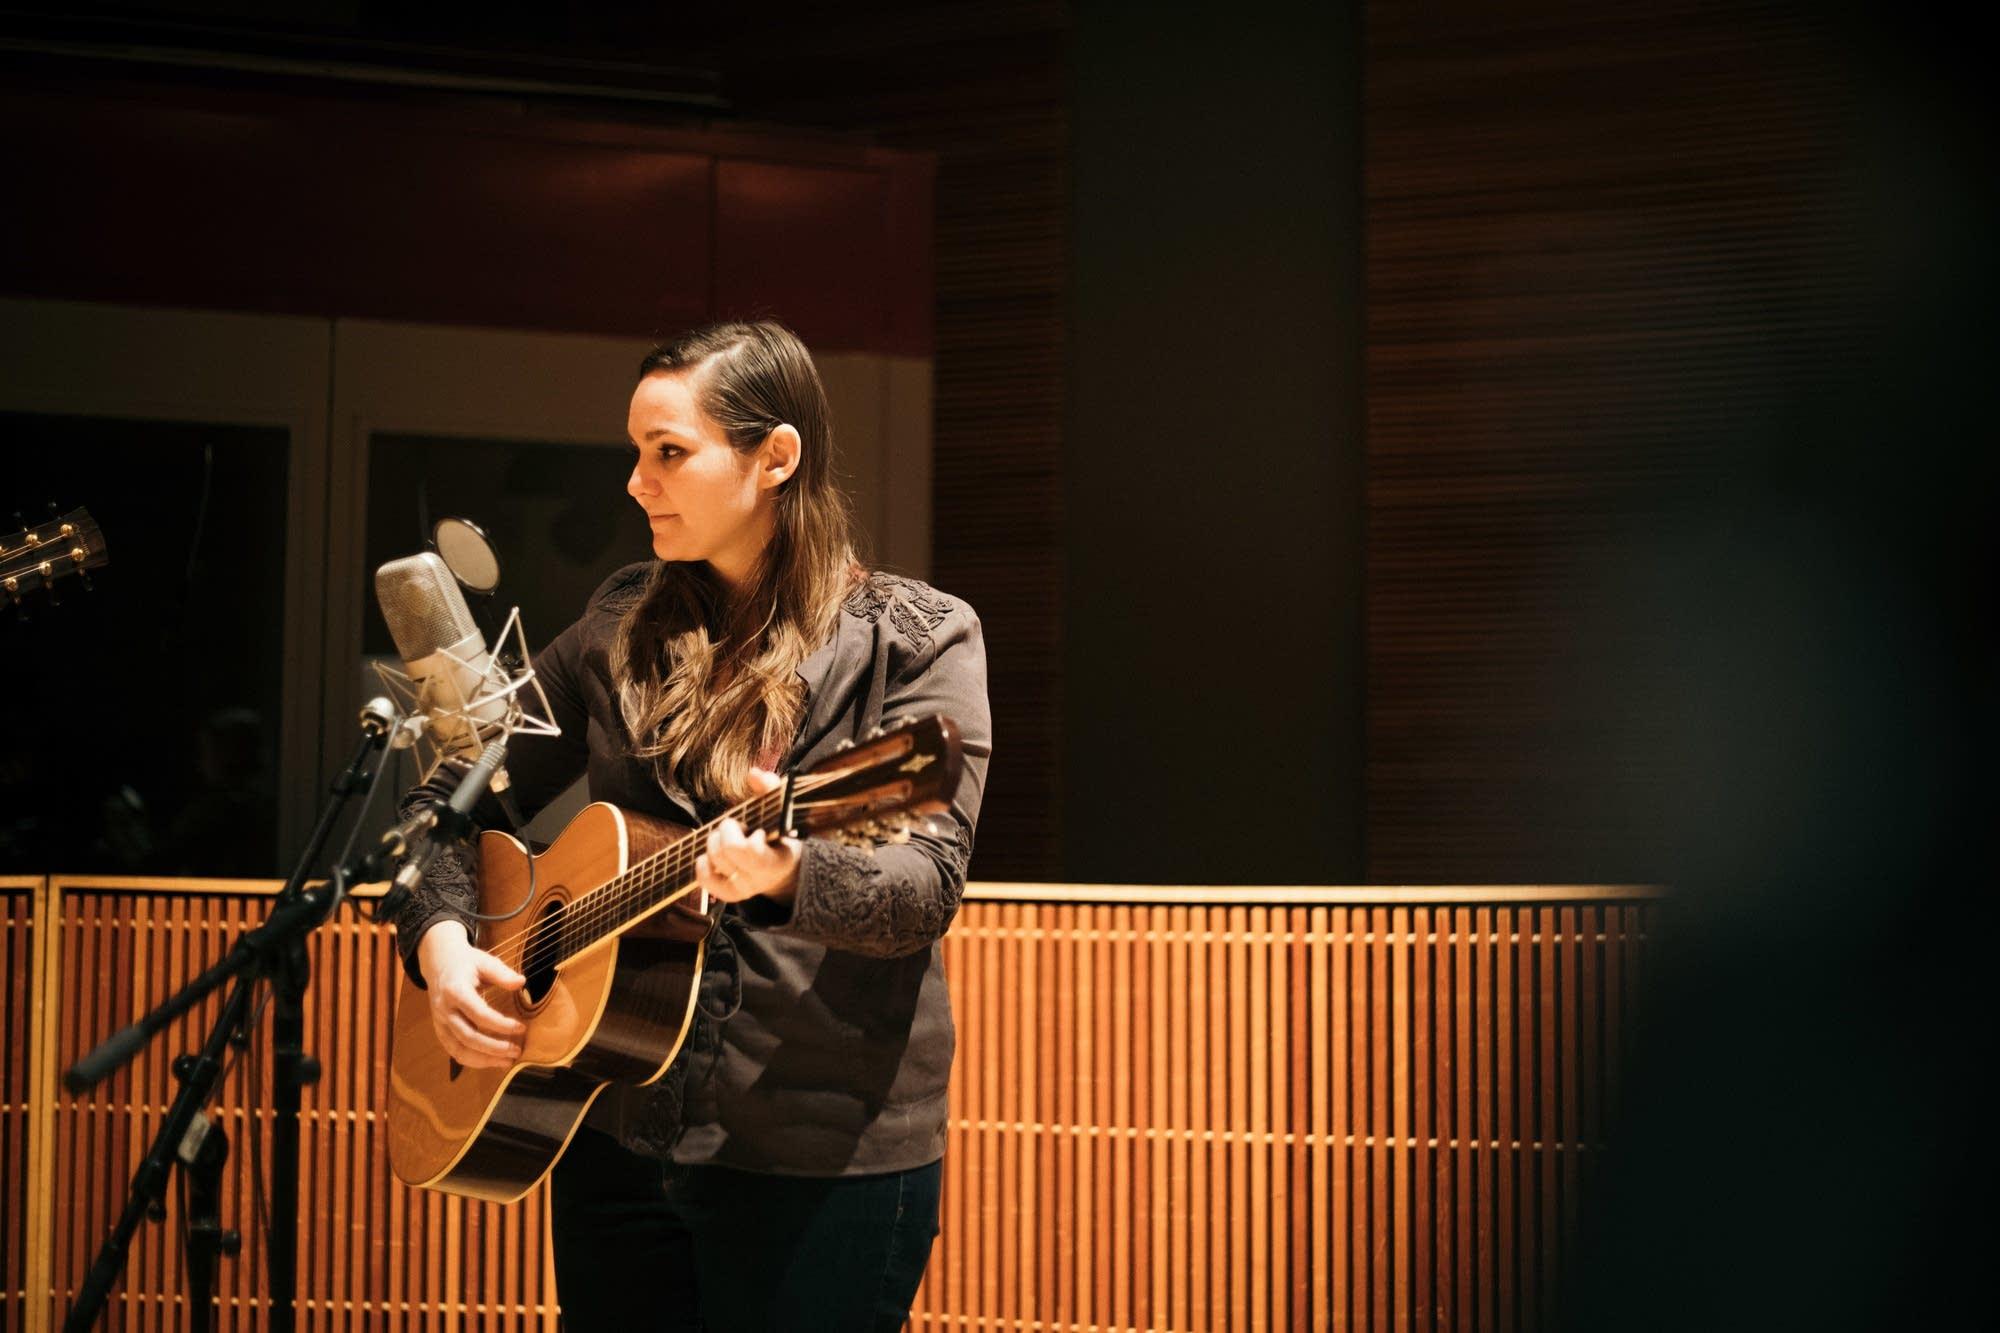 Letitia VanSant performs in the Radio Heartland studio